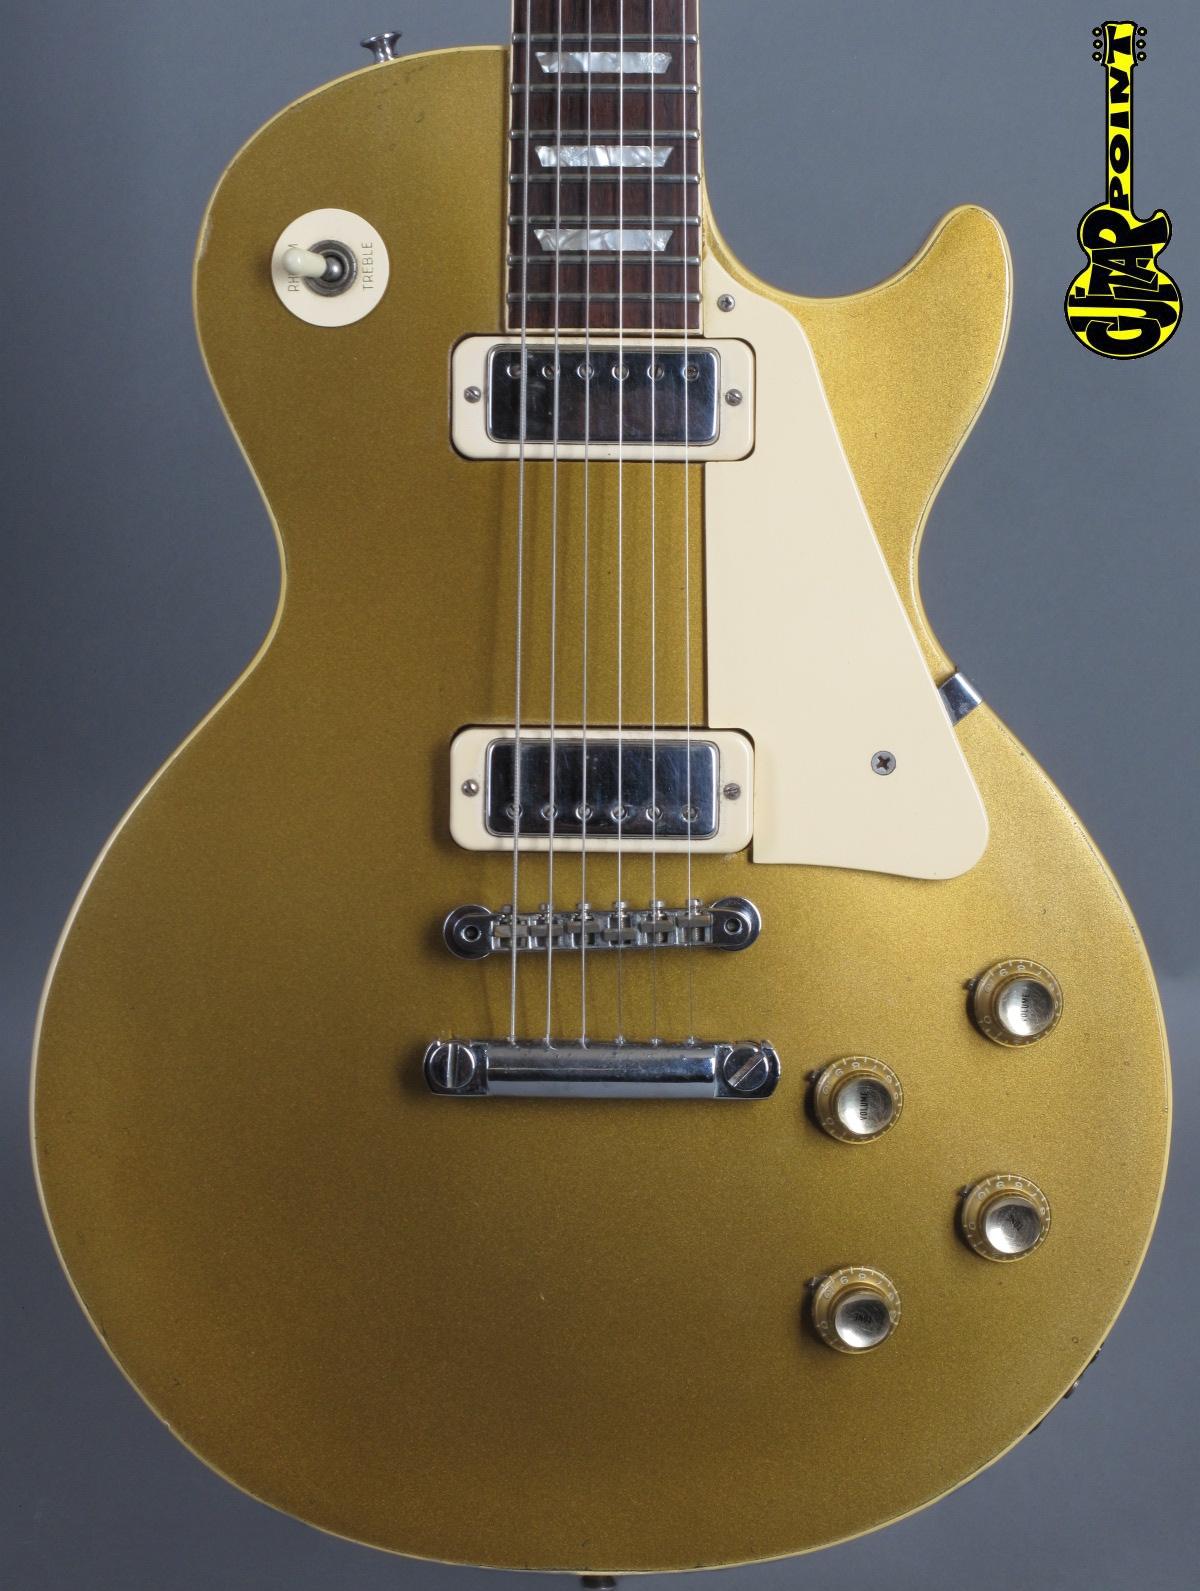 1971 Gibson Les Paul Deluxe - Goldtop